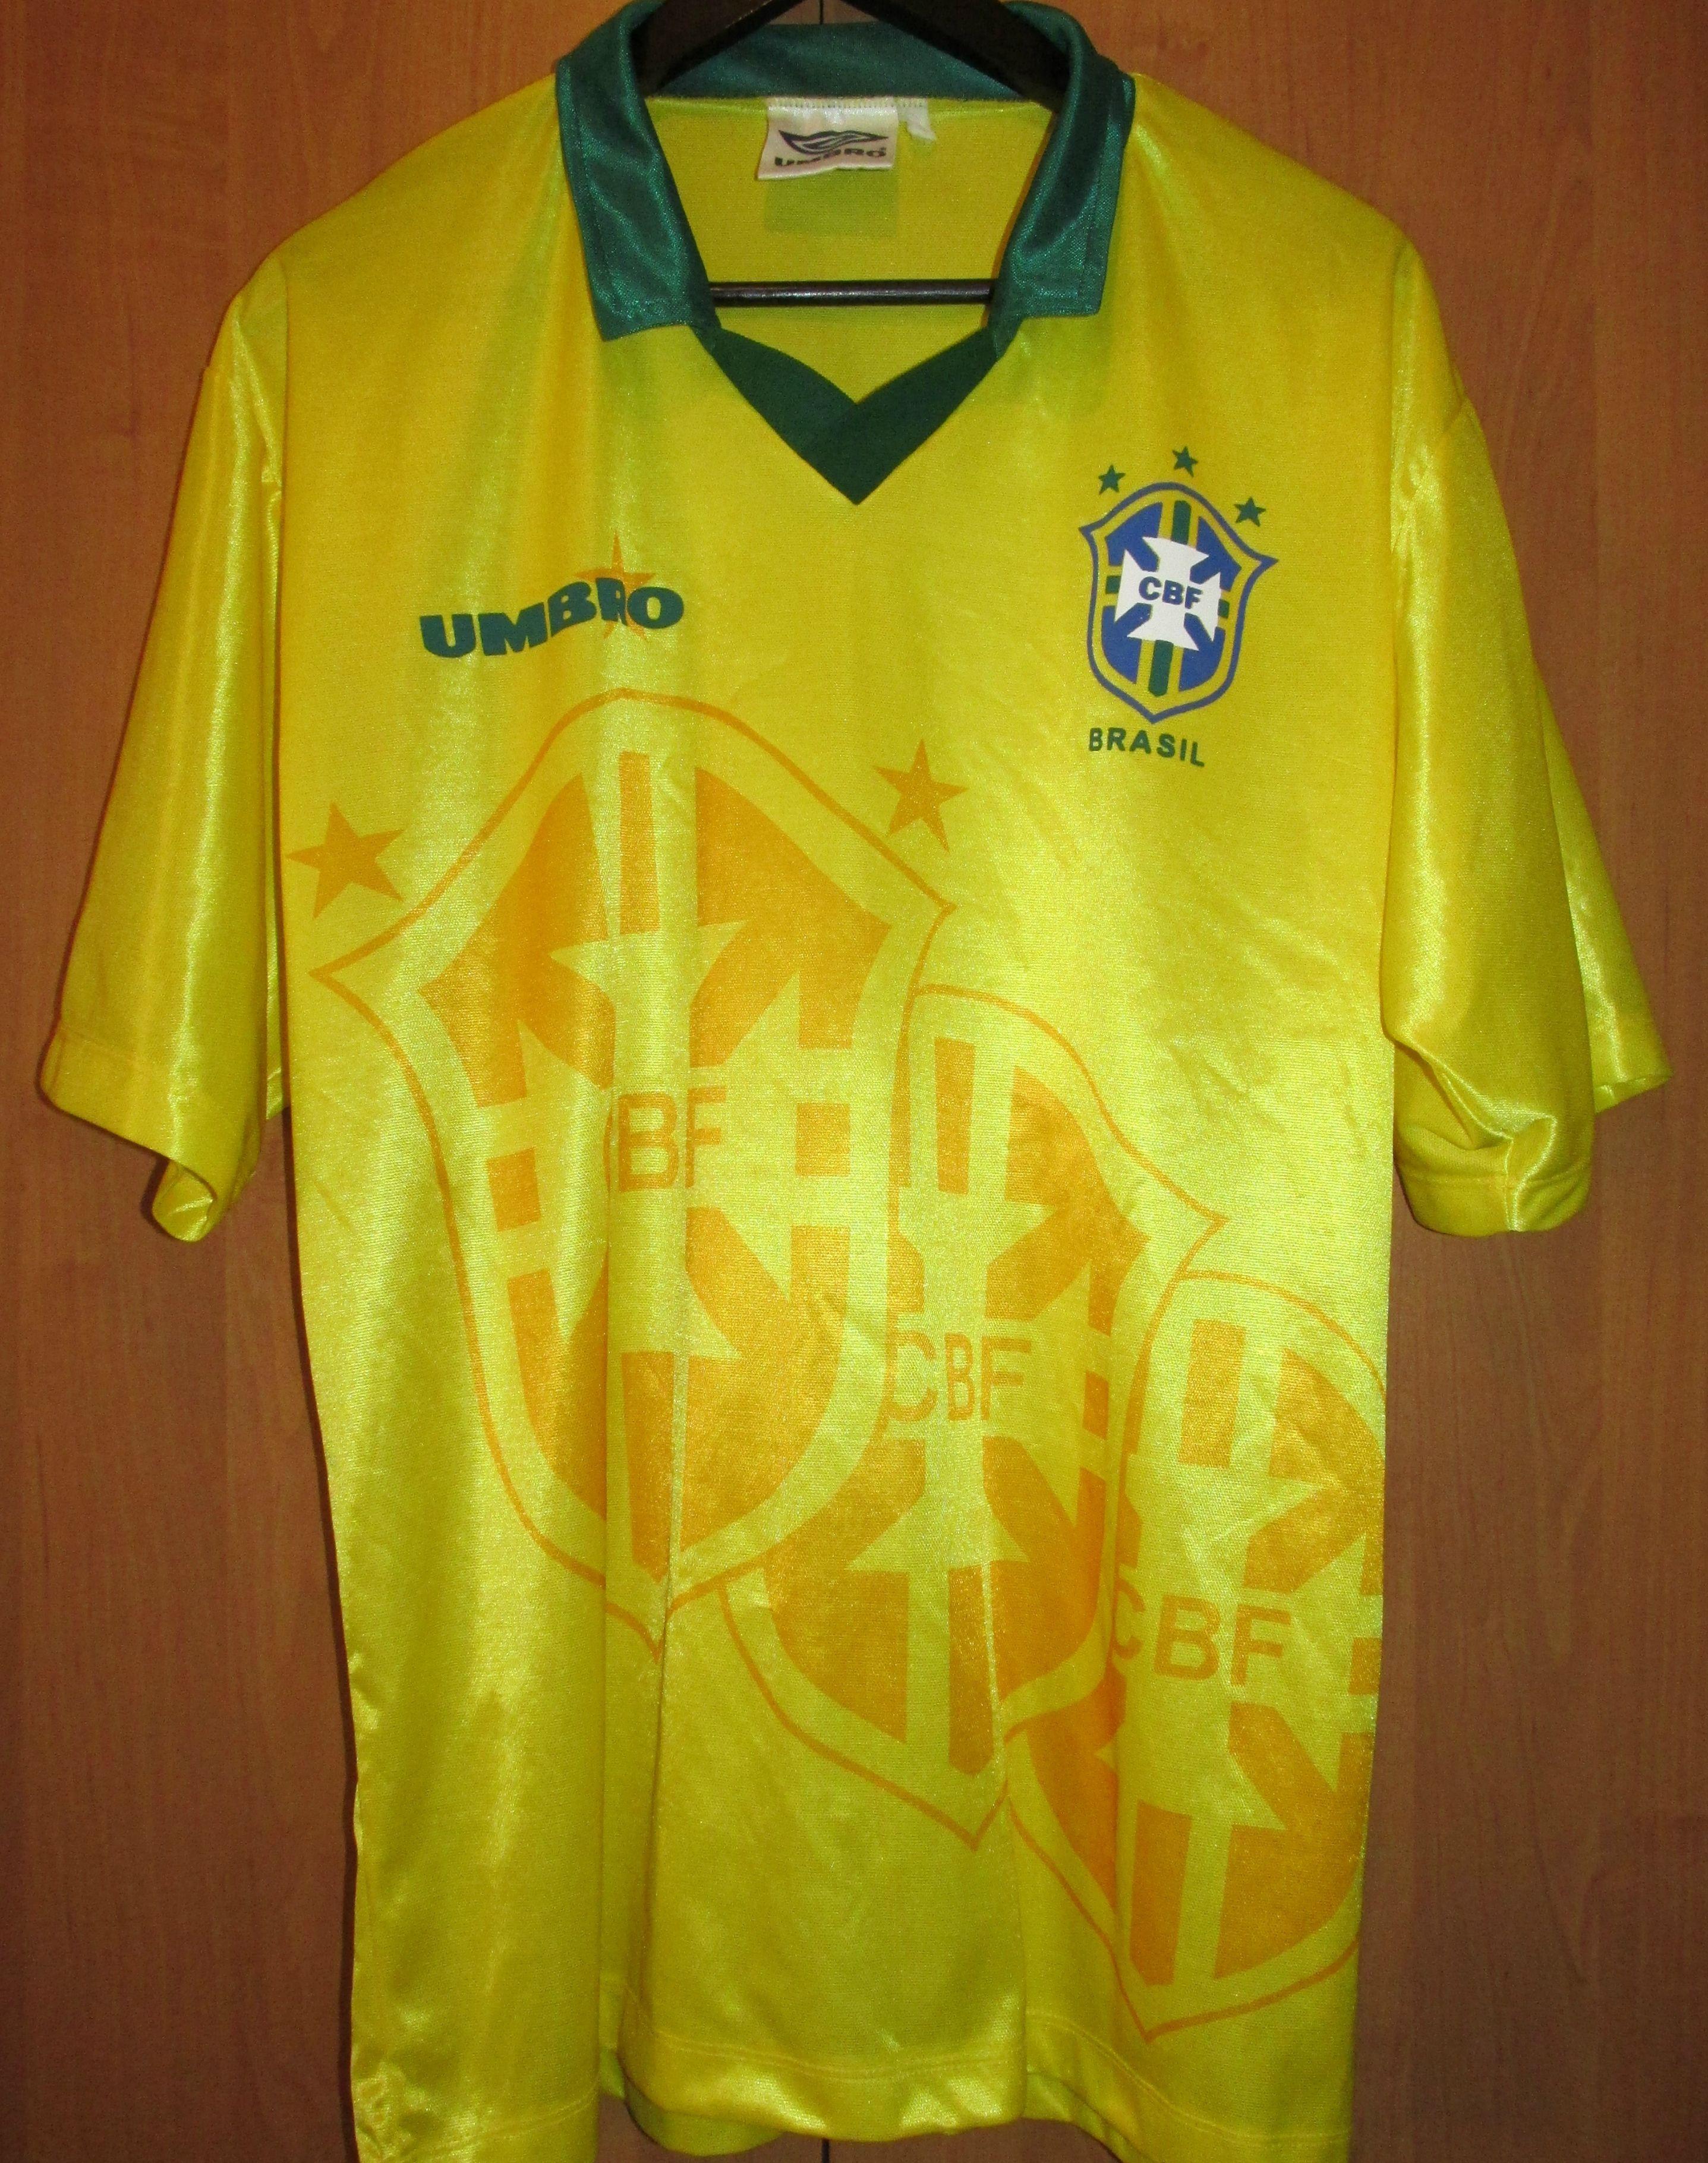 6c587280e Brazil 1992 1993 home football shirt by Umbro Brasil vintage jersey  camiseta futbol CBF 90s retro  brasil  brazil  worldcup  jersey  umbro   soccer  football ...